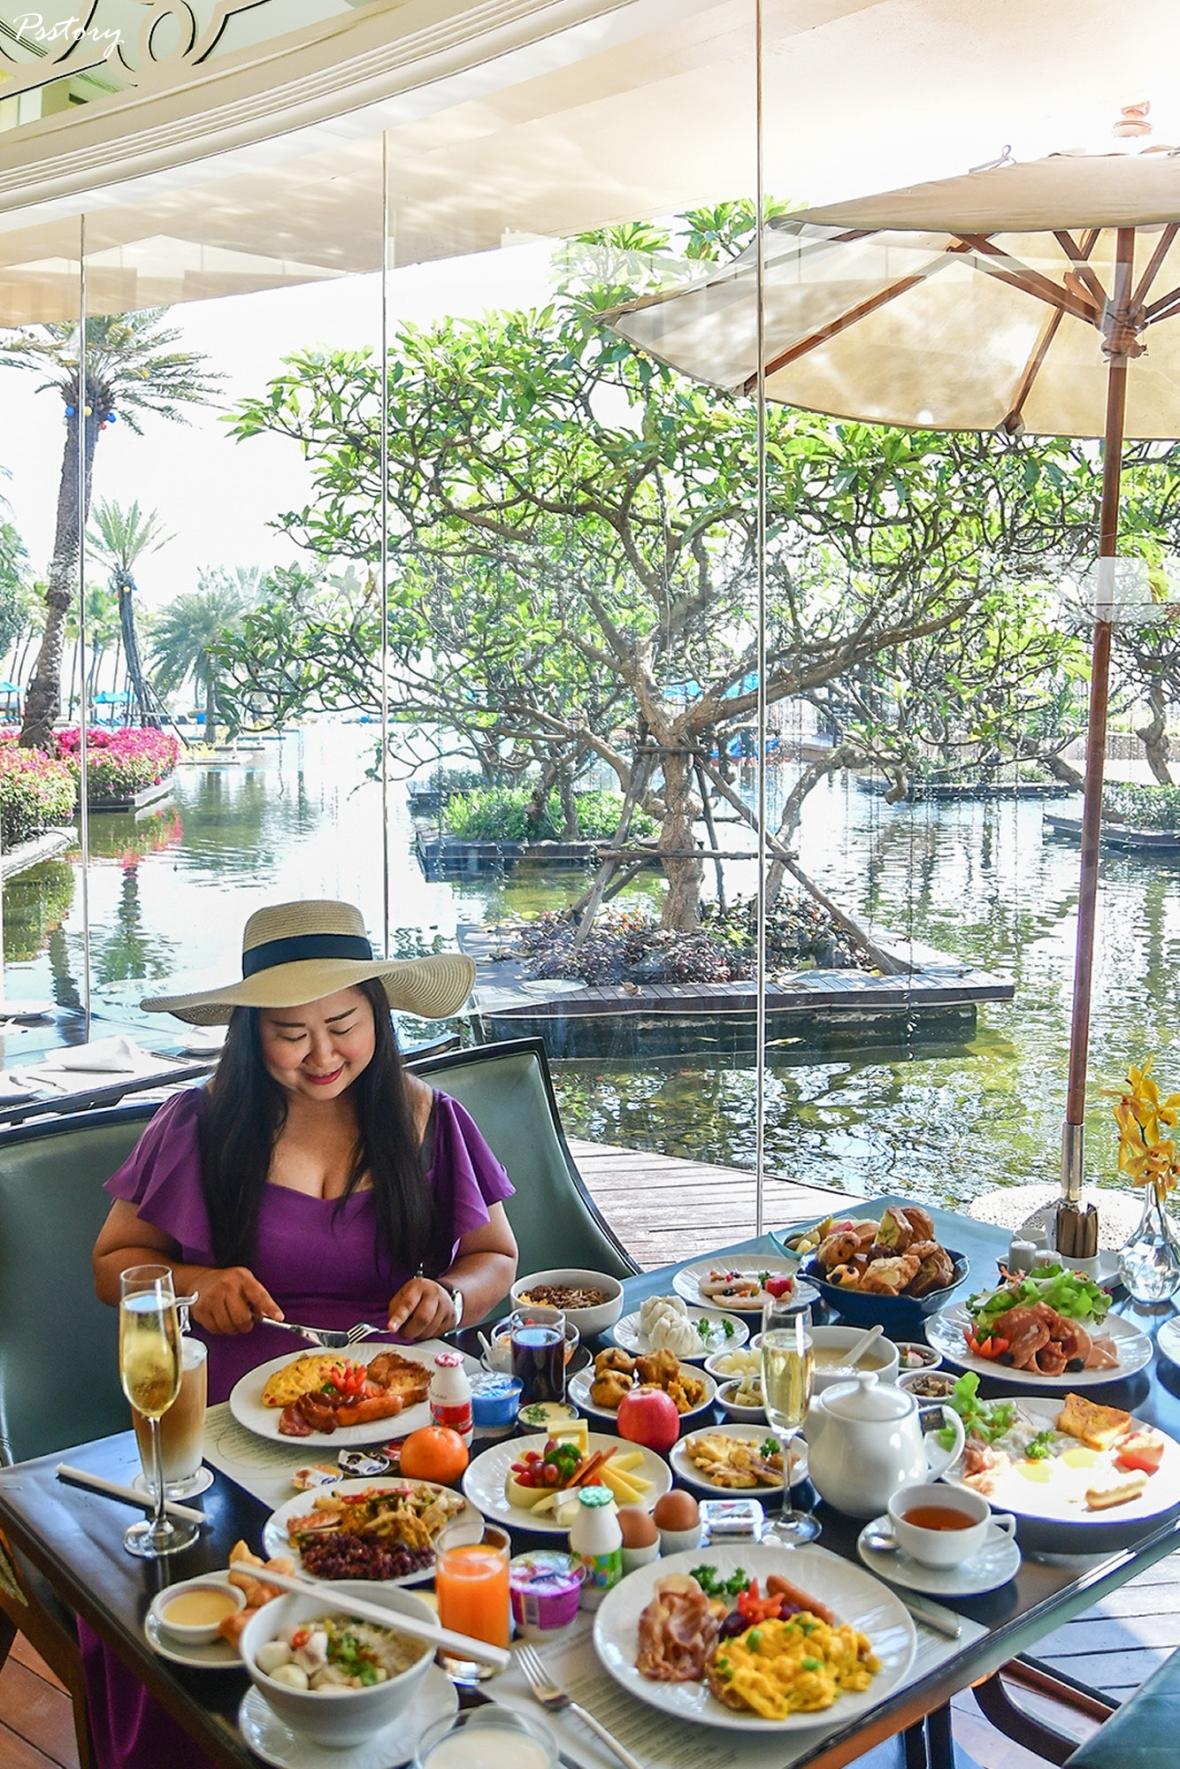 Dusit Thani Hua Hin Hotel (148)